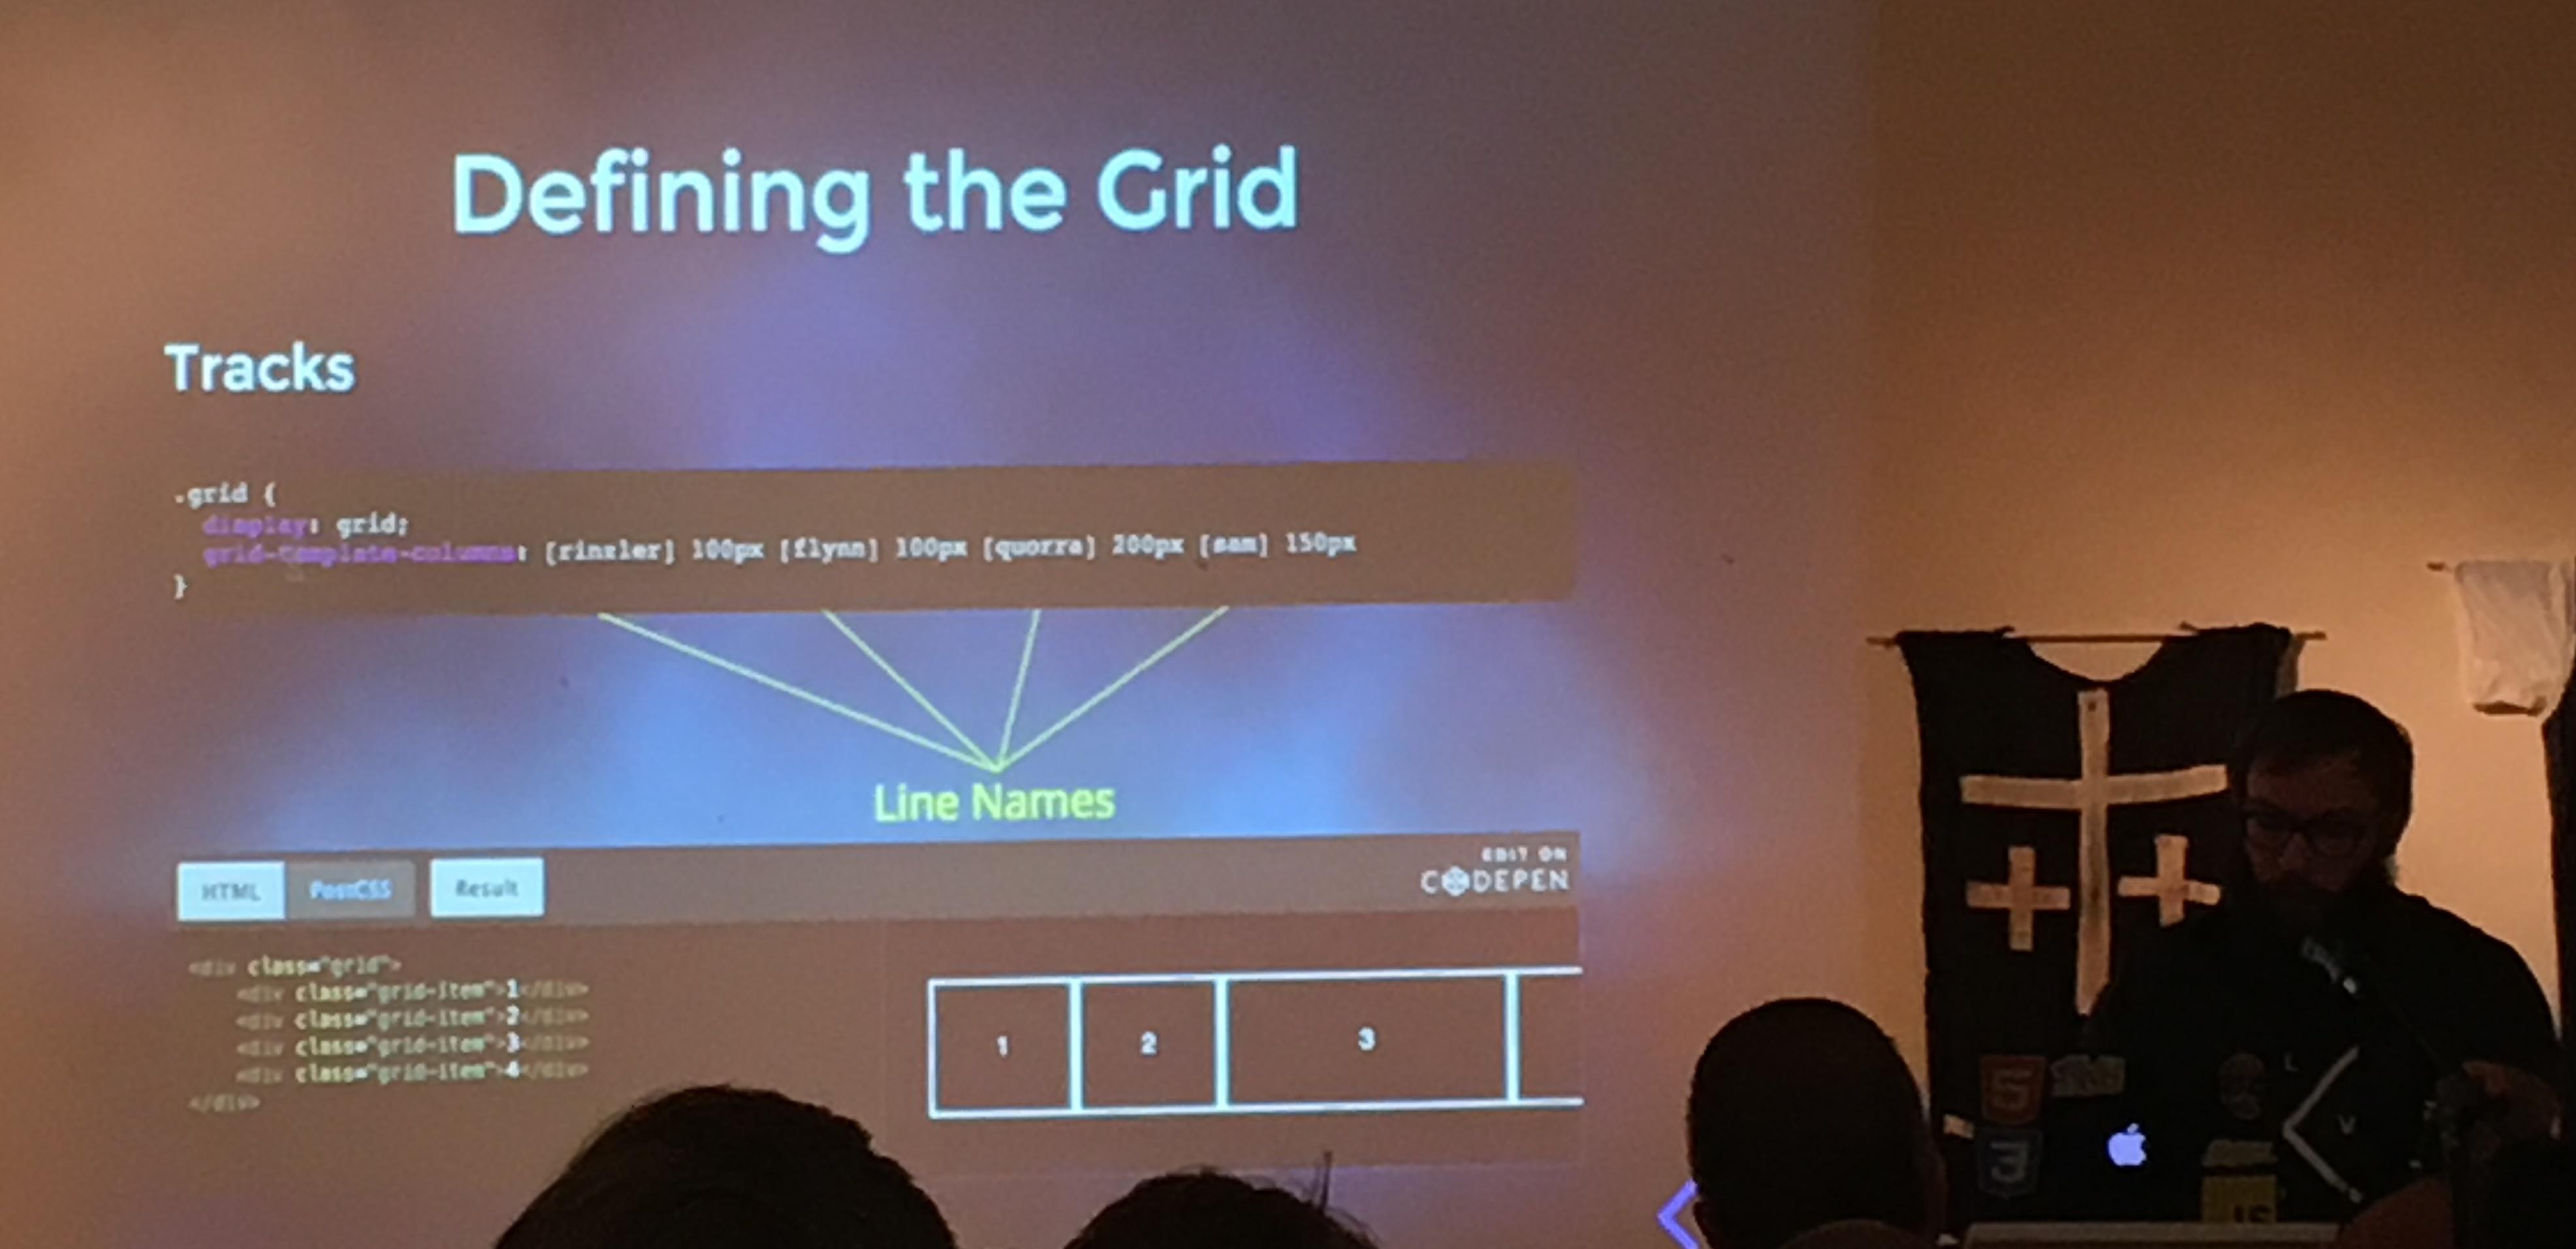 Name grid lines